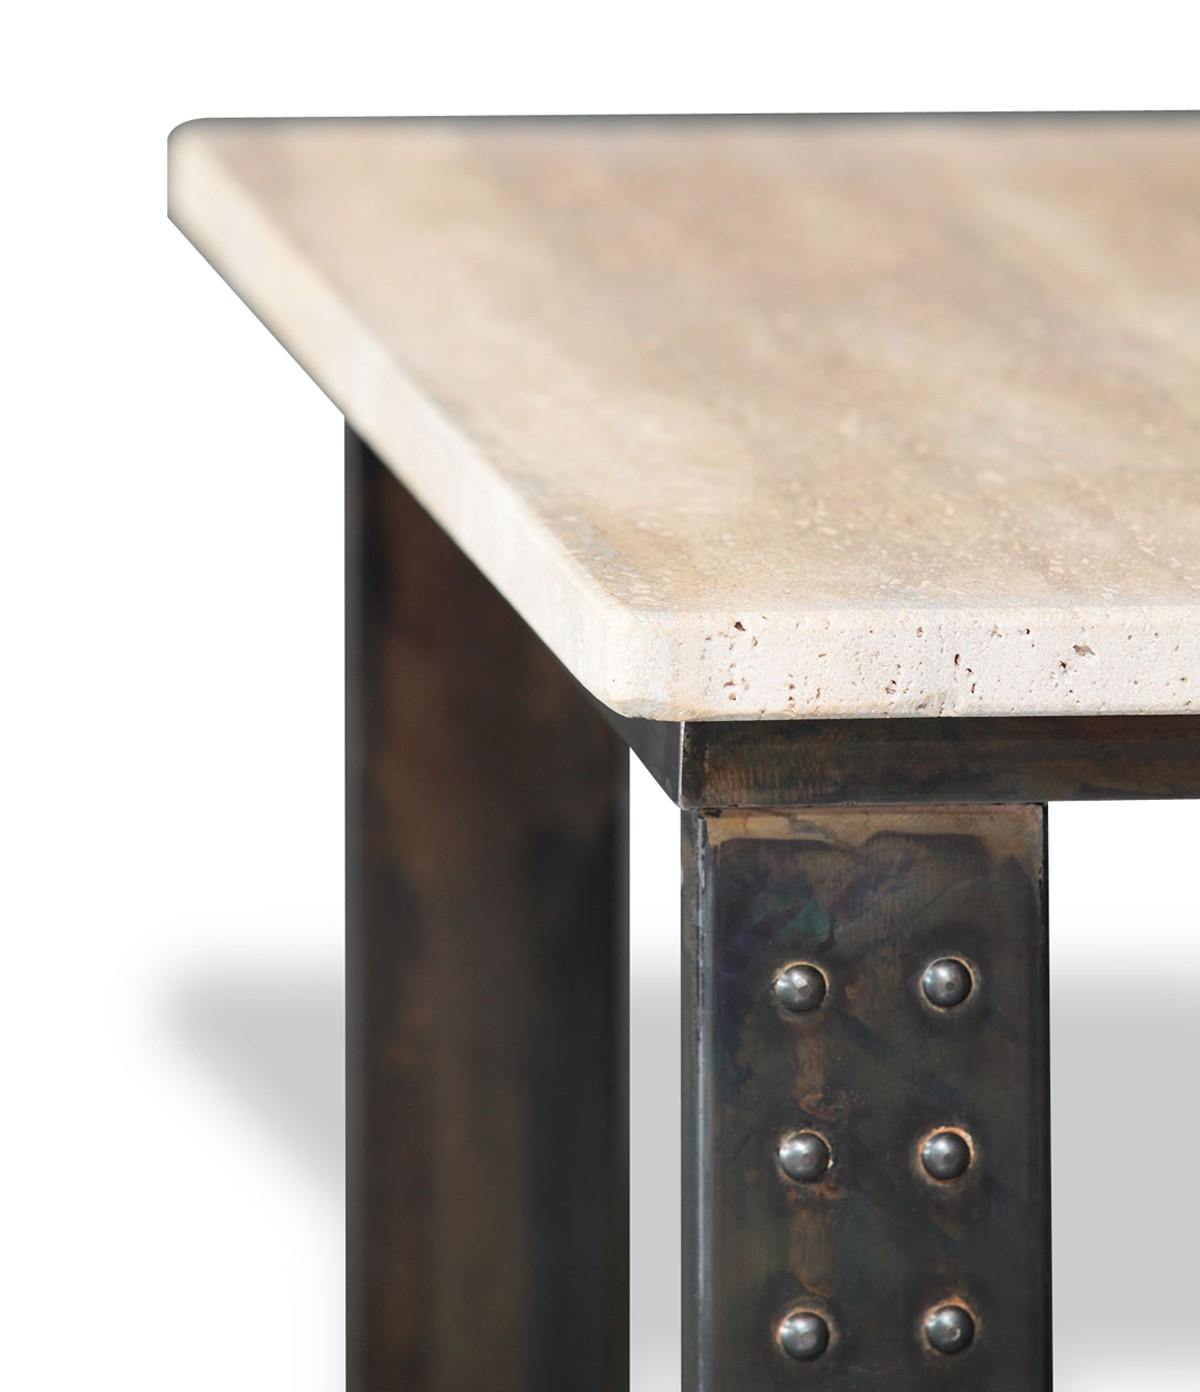 table en pierre de travertin noce clair pied atelier. Black Bedroom Furniture Sets. Home Design Ideas